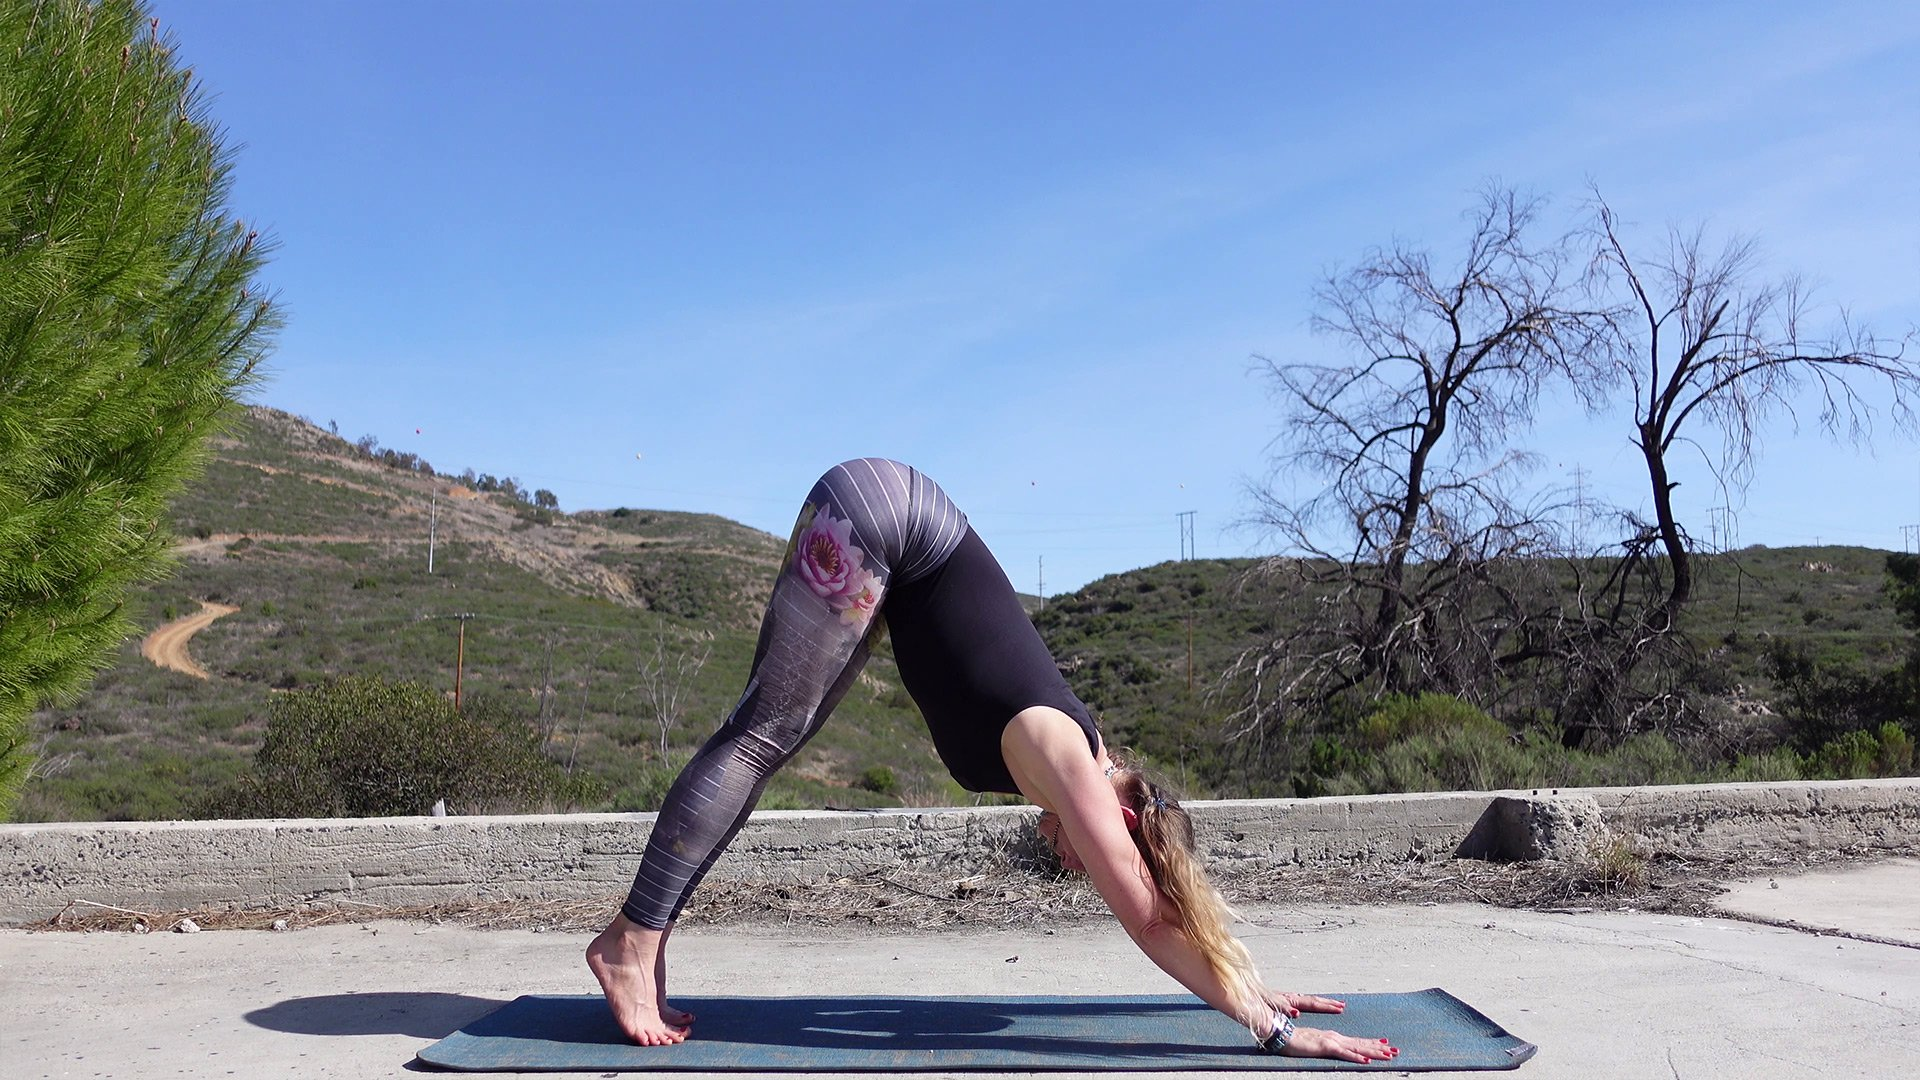 Yoga Videos Online - My Yoga Online - YouTube